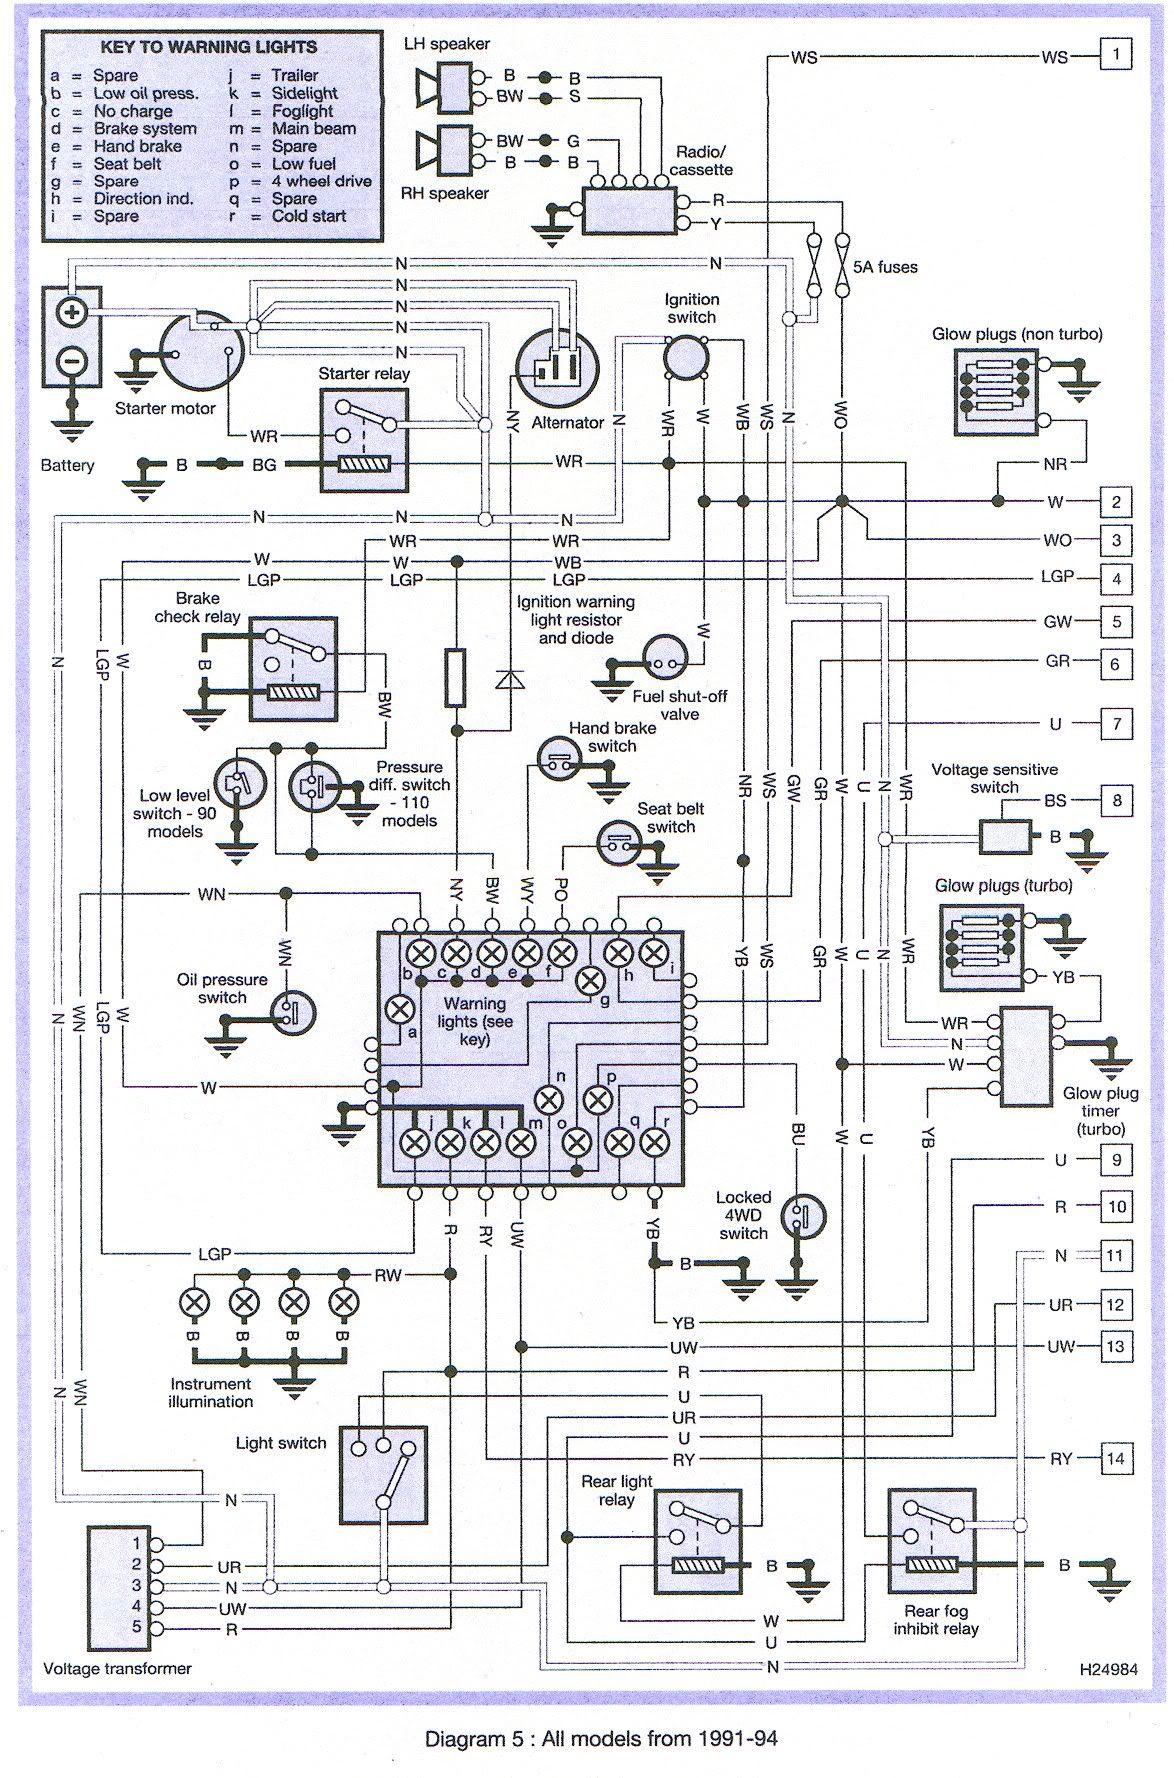 1976 f250 wiring diagram printable